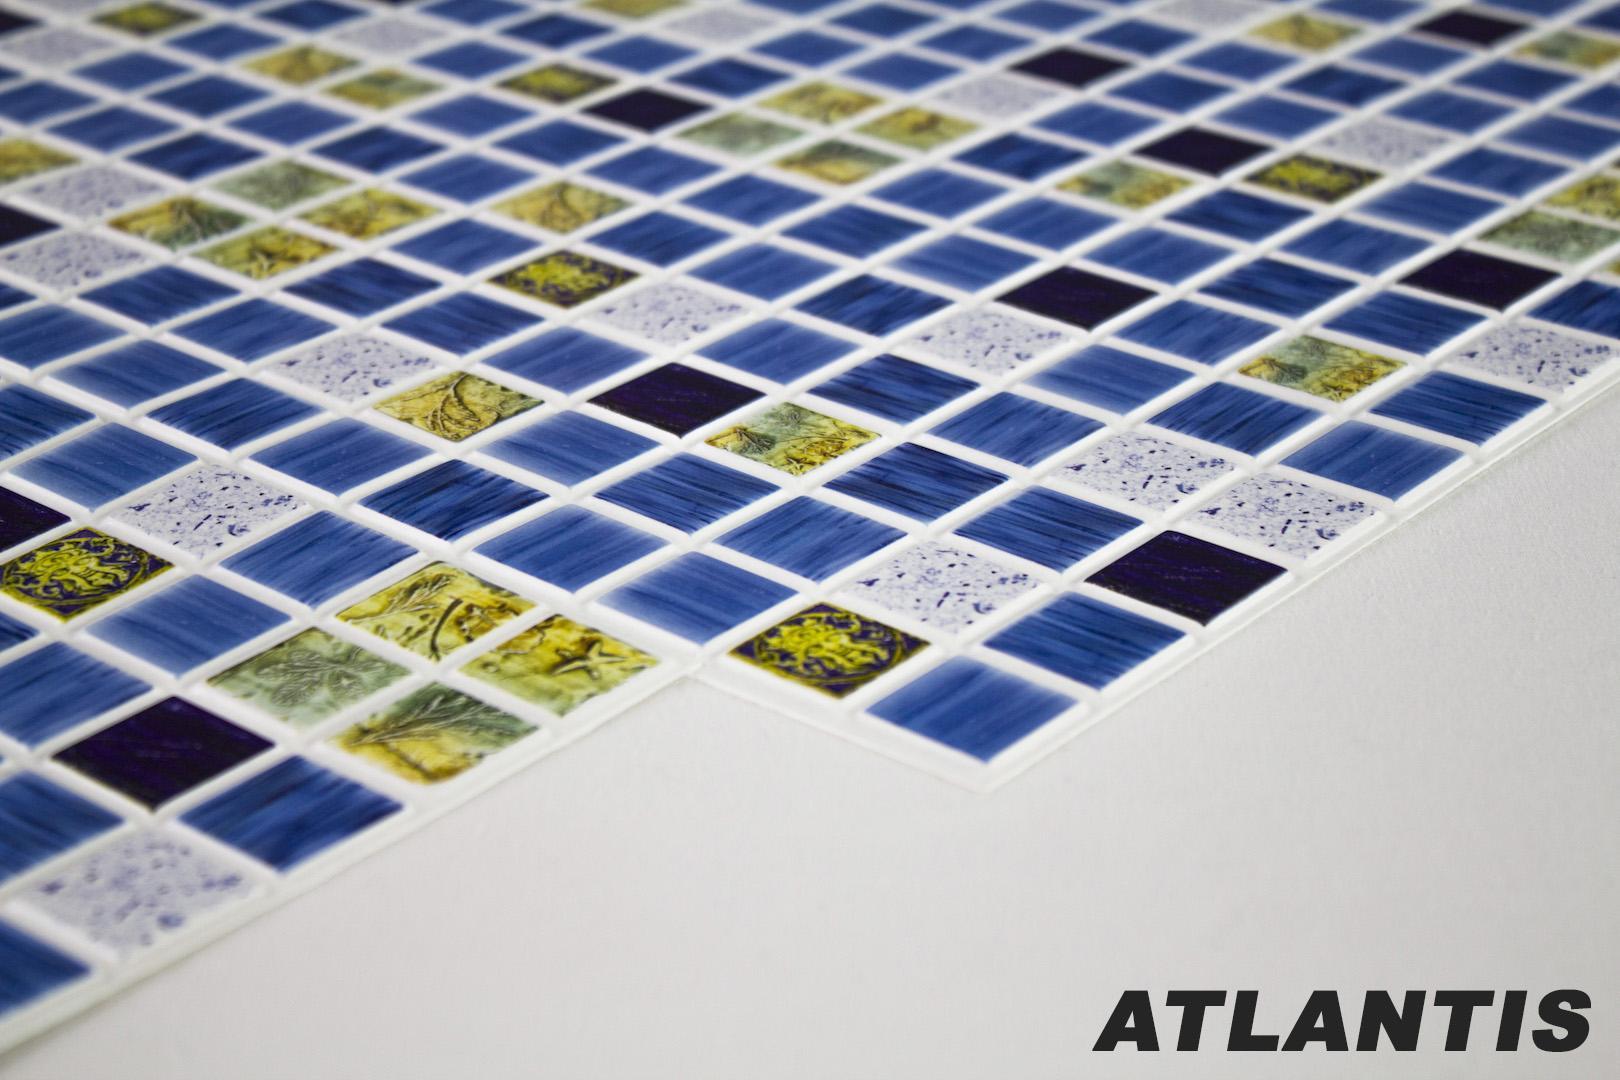 1 pvc dekorplatte mosaic wandverkleidung platten wand innen 95x48cm atlantis. Black Bedroom Furniture Sets. Home Design Ideas